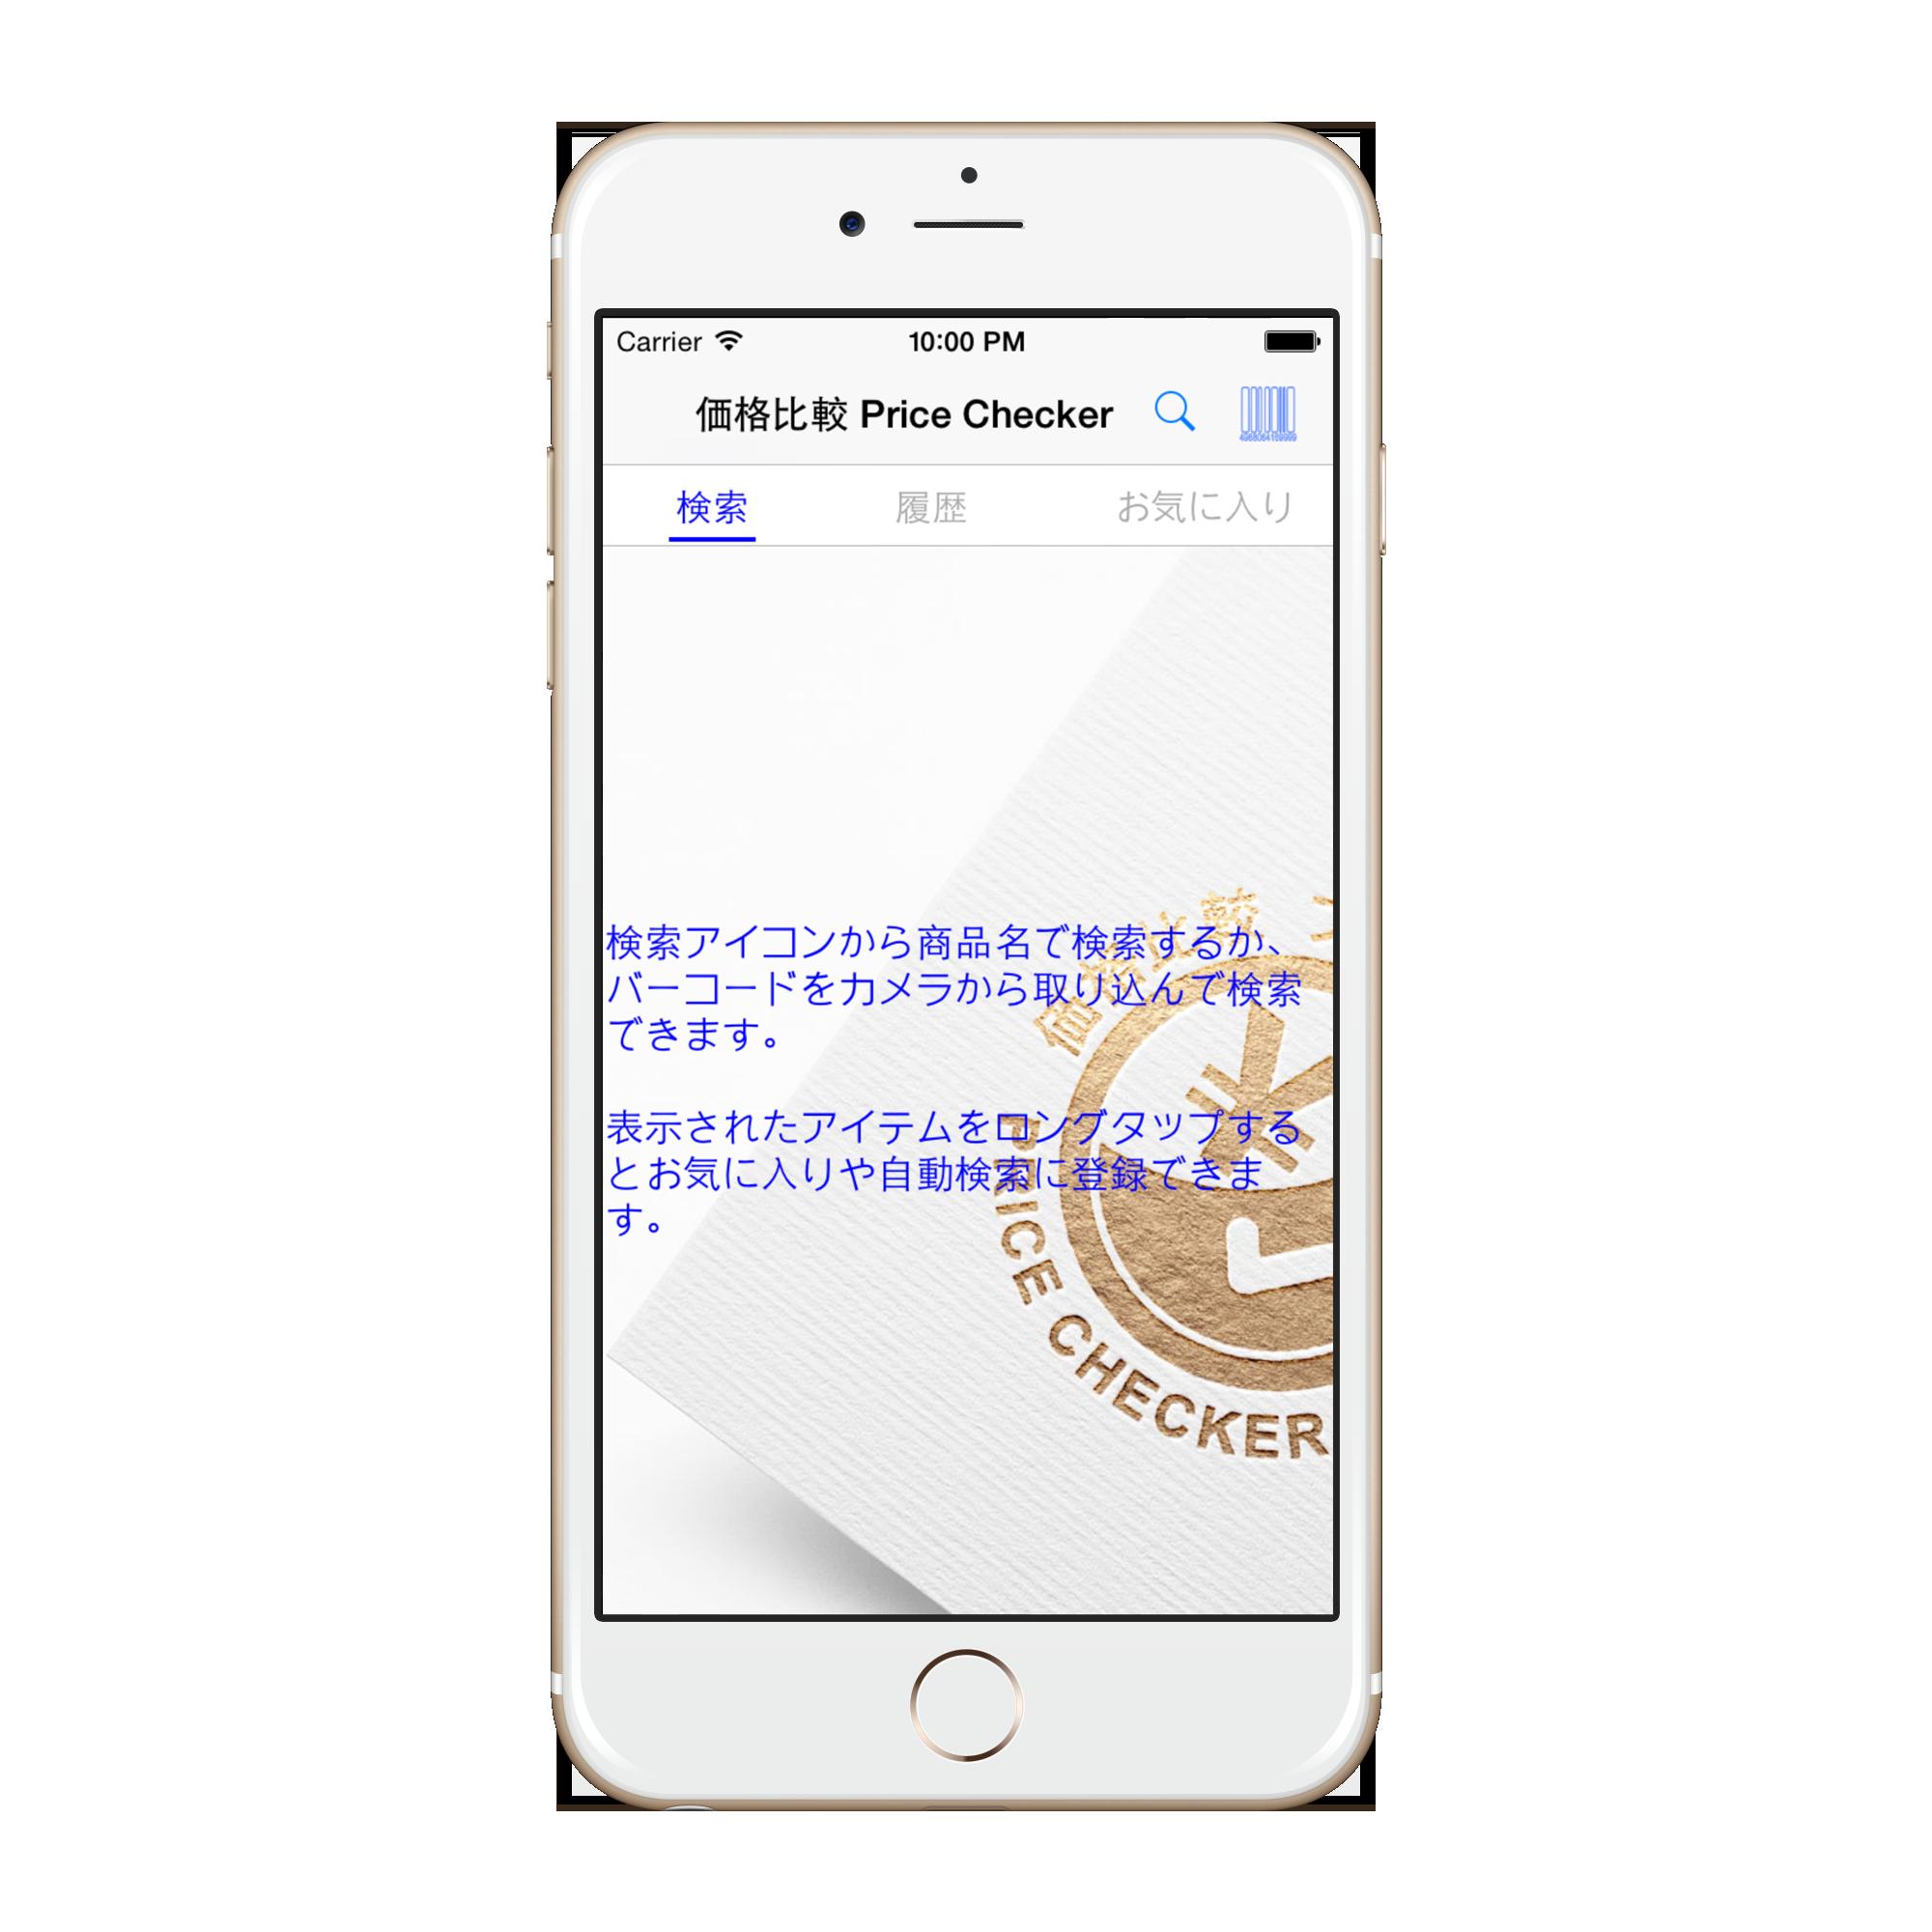 2_iphone4_ja-JP-iPhone5-1-LandingScreen-portrait_framed